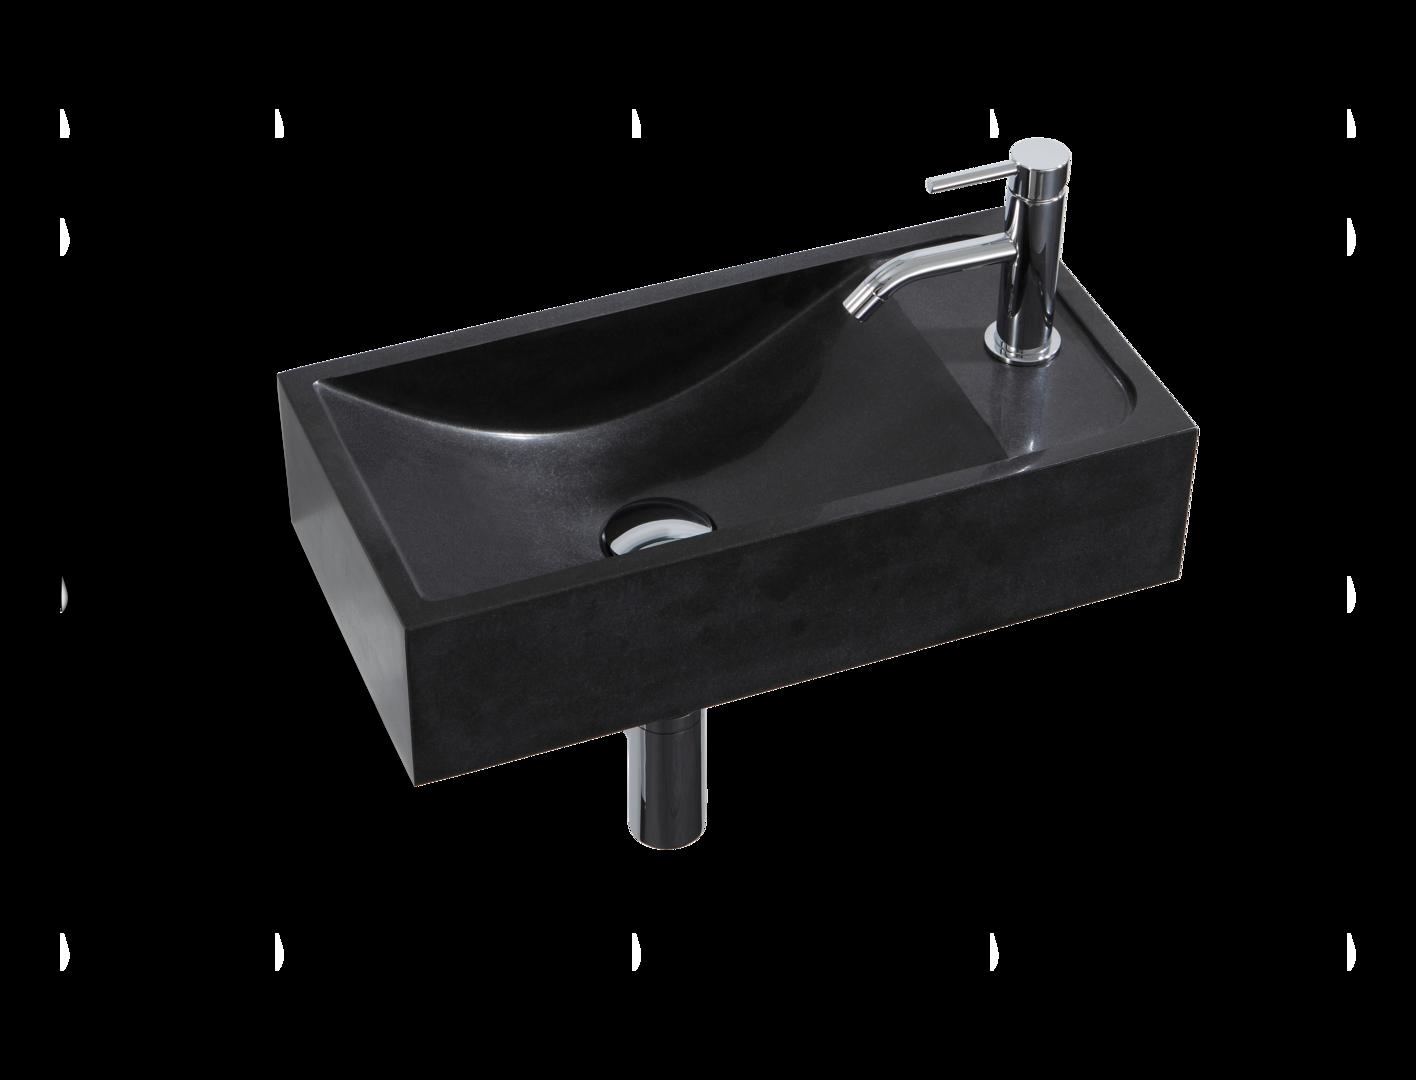 handwaschbecken hwb 1 r decor walther. Black Bedroom Furniture Sets. Home Design Ideas